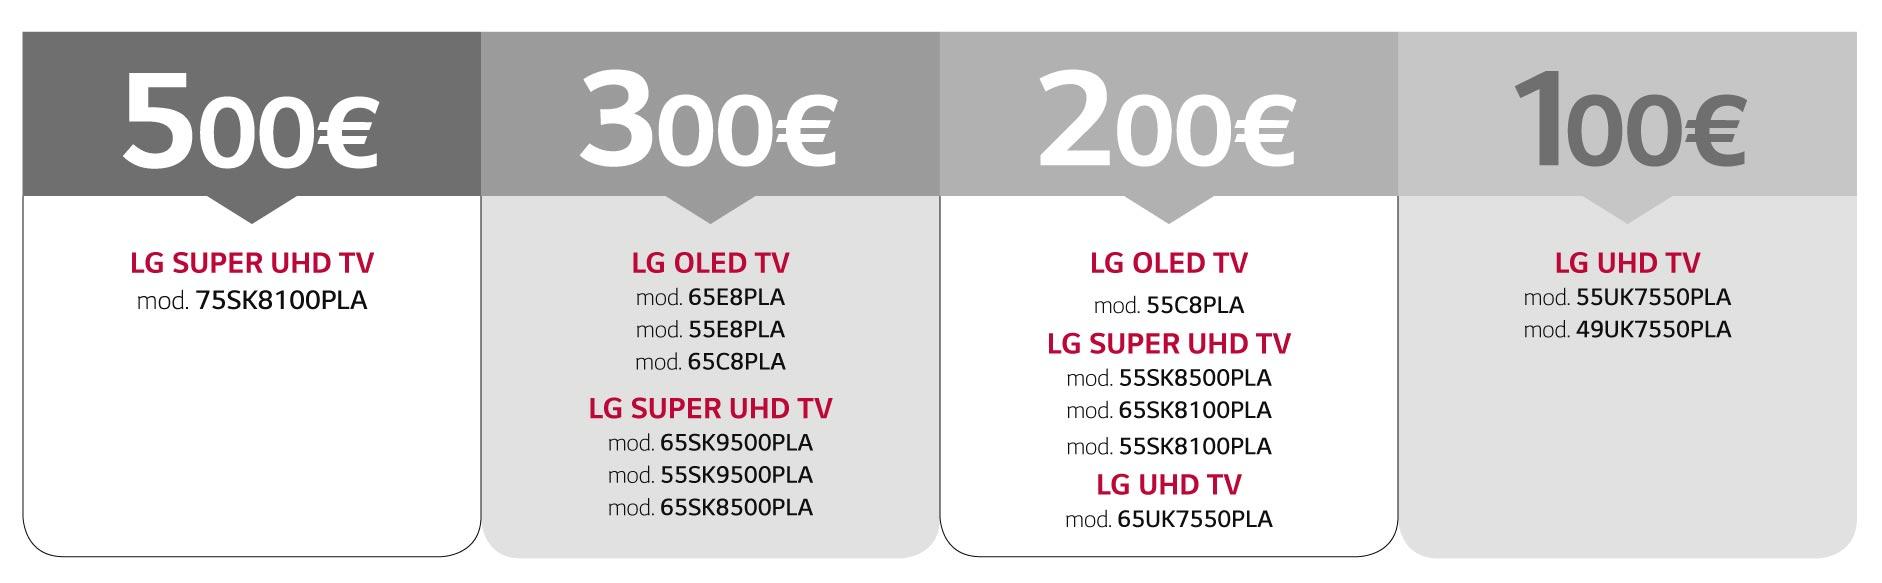 lg promo - LG OLED TV e LCD 2018: rimborsi fino a 500 Euro sull'acquisto